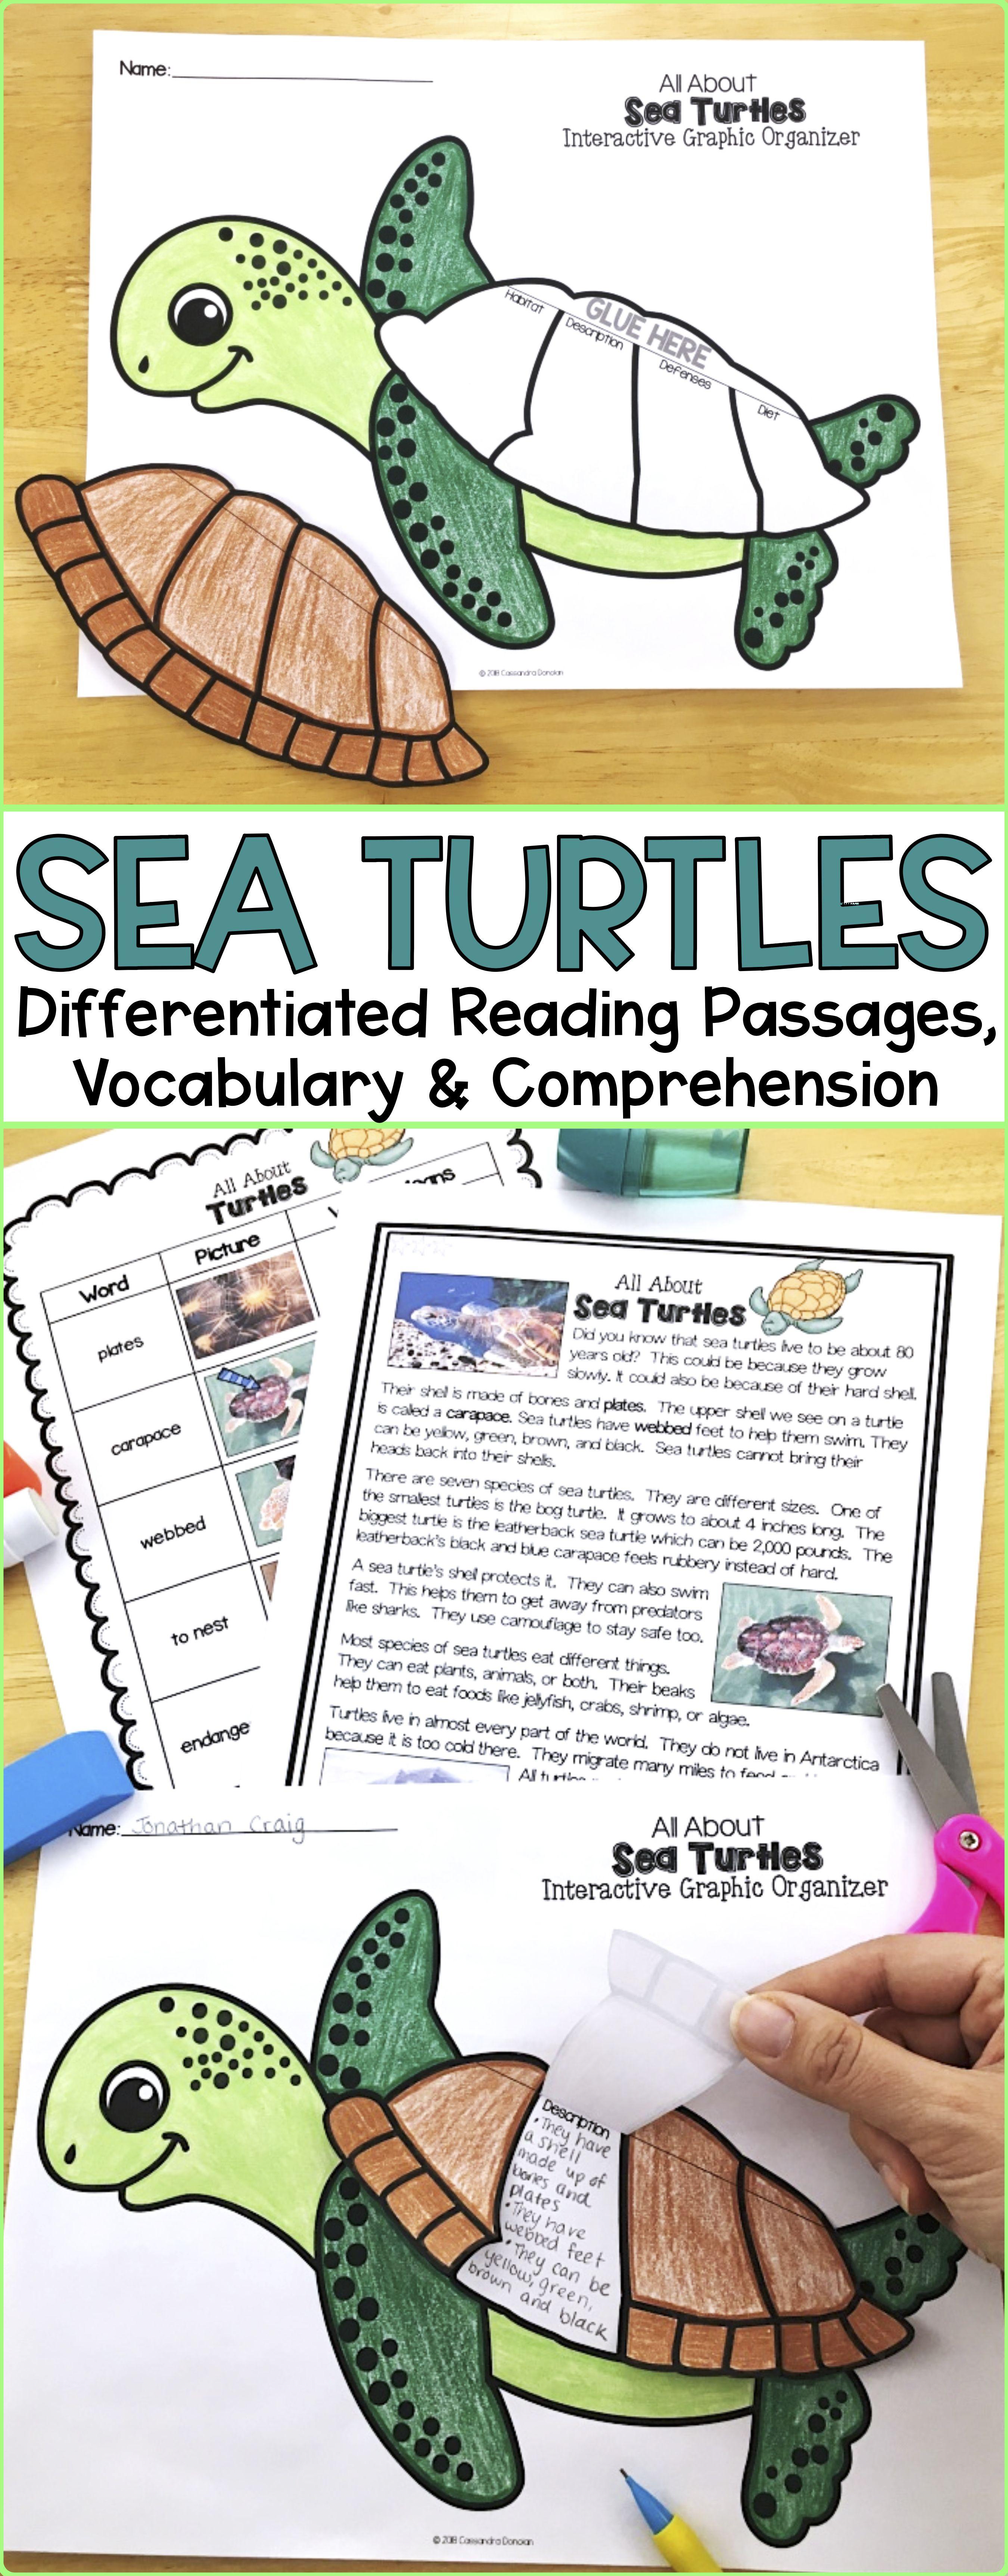 Ocean Animals Reading Sea Turtles Differentiated Passages Amp Comprehension